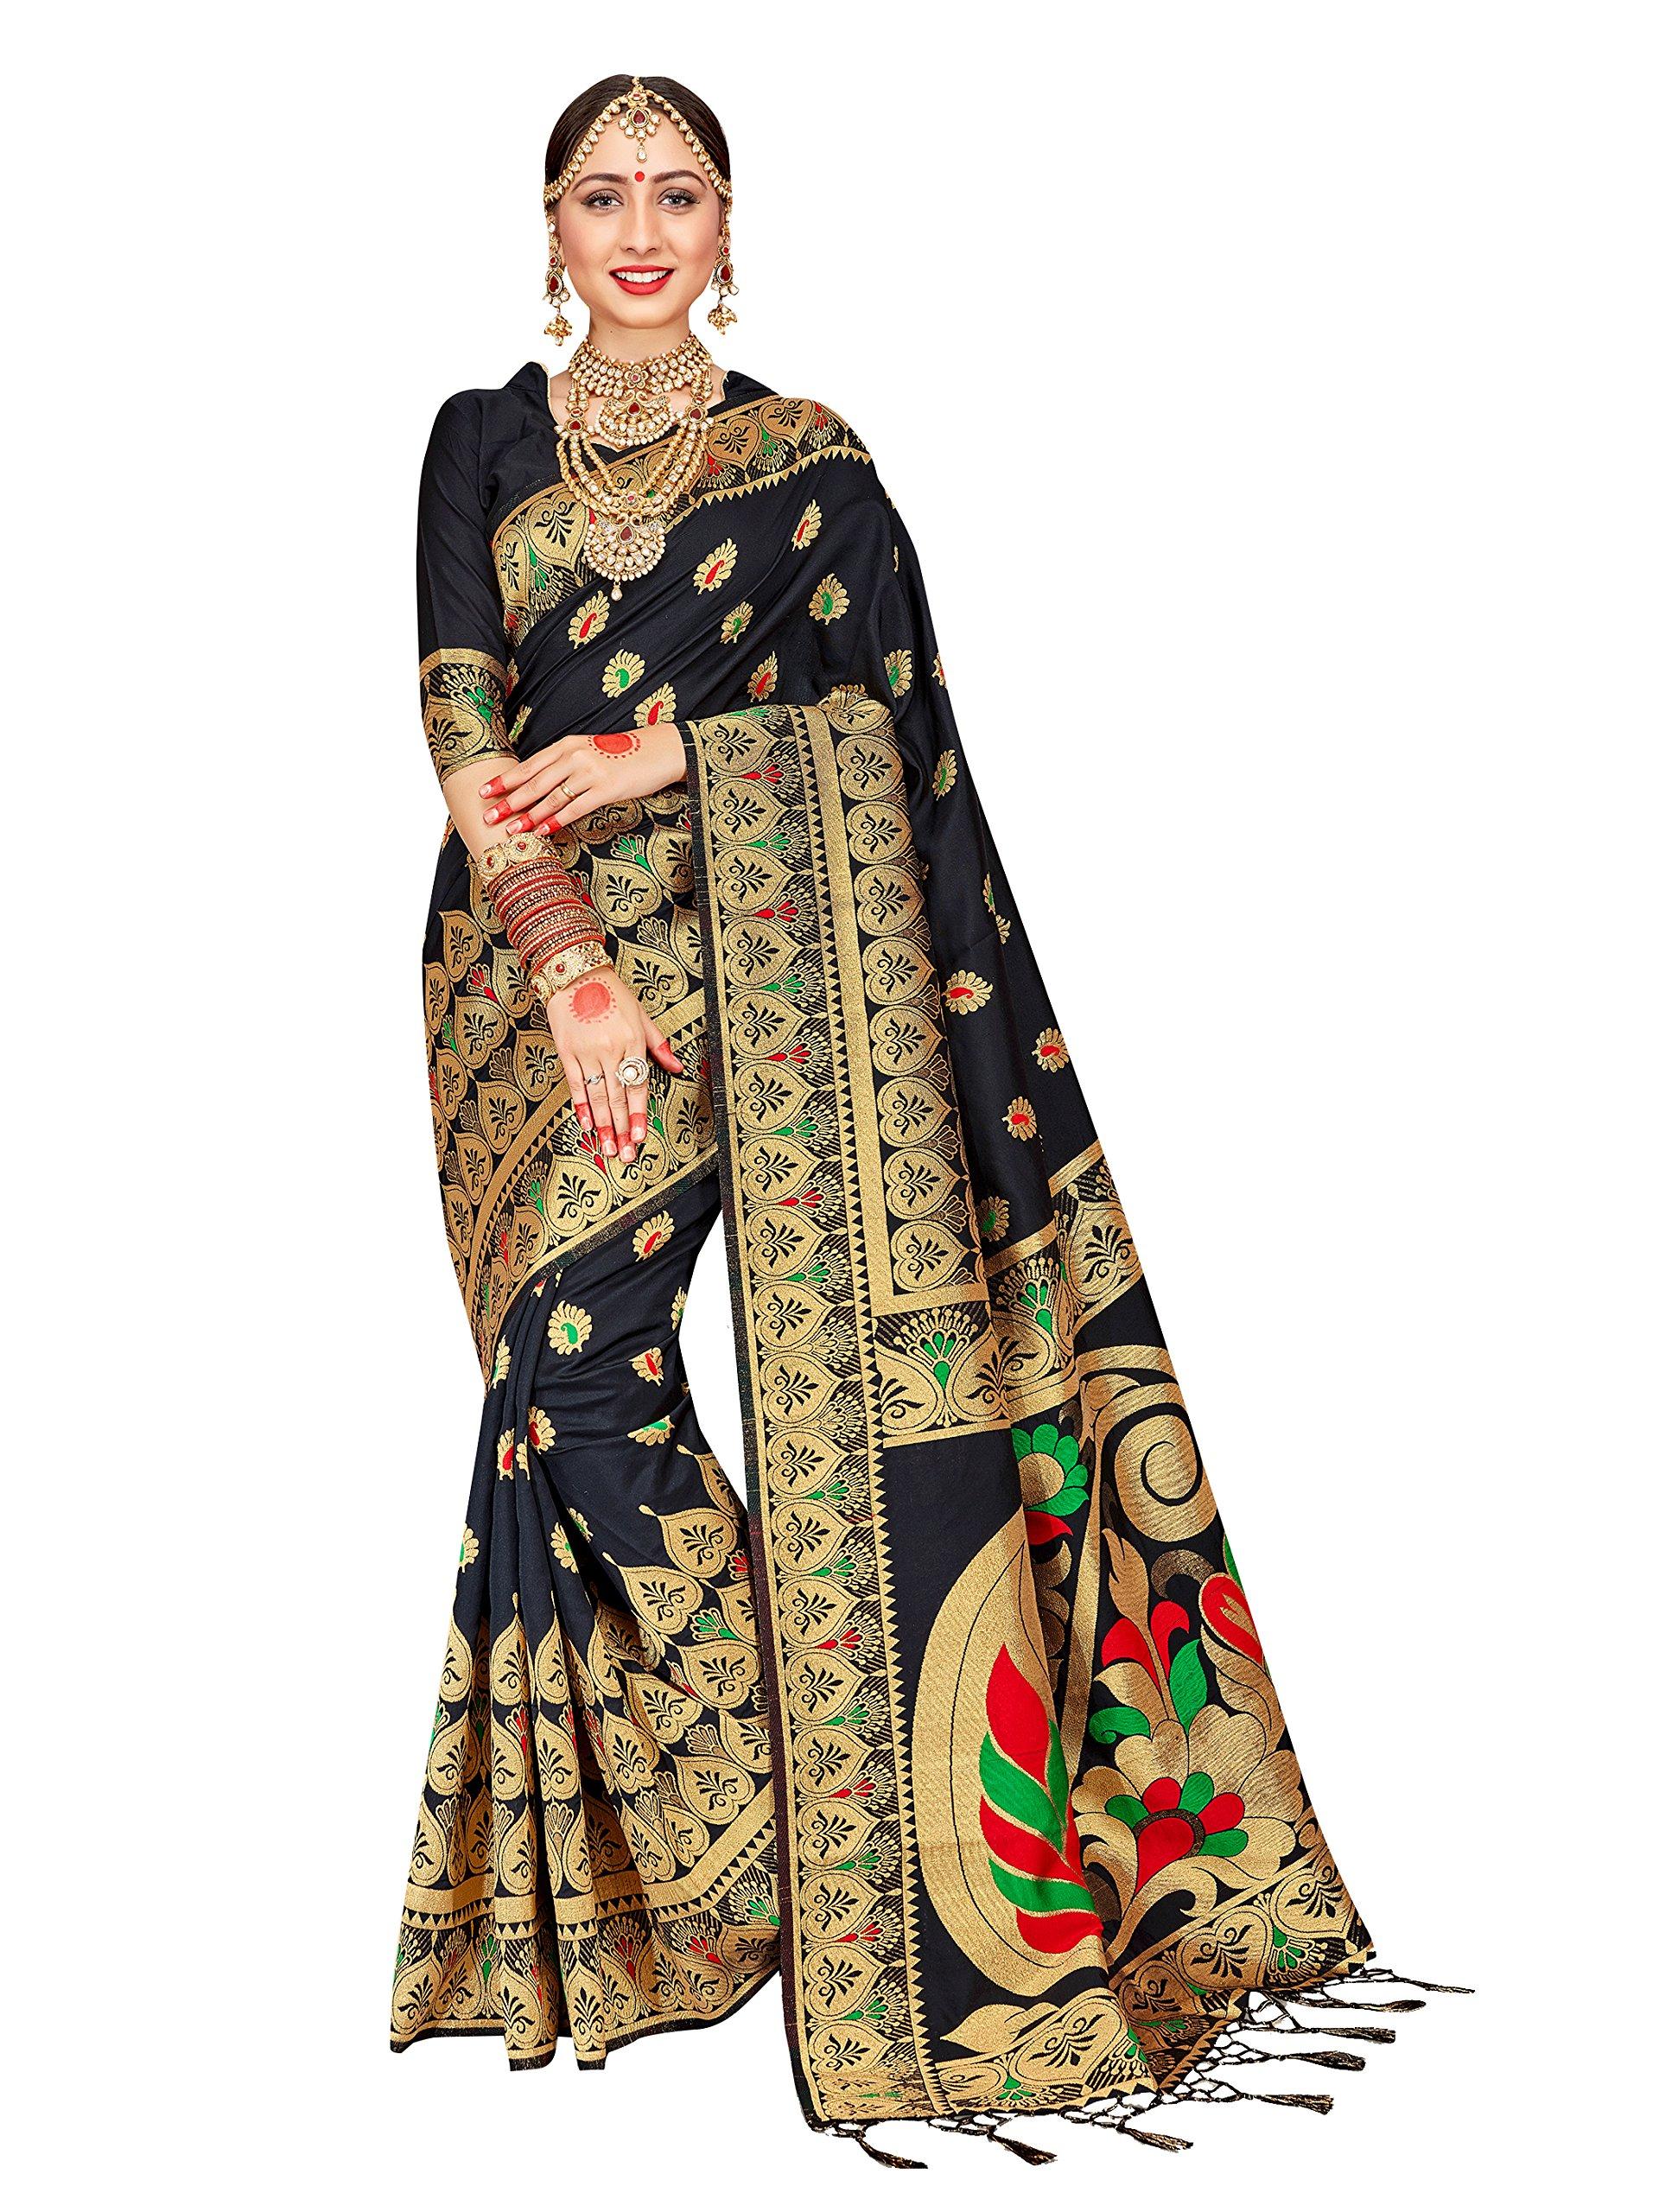 ELINA FASHION Sarees For Women Banarasi Art Silk Woven Saree l Indian Wedding Traditional Wear Sari